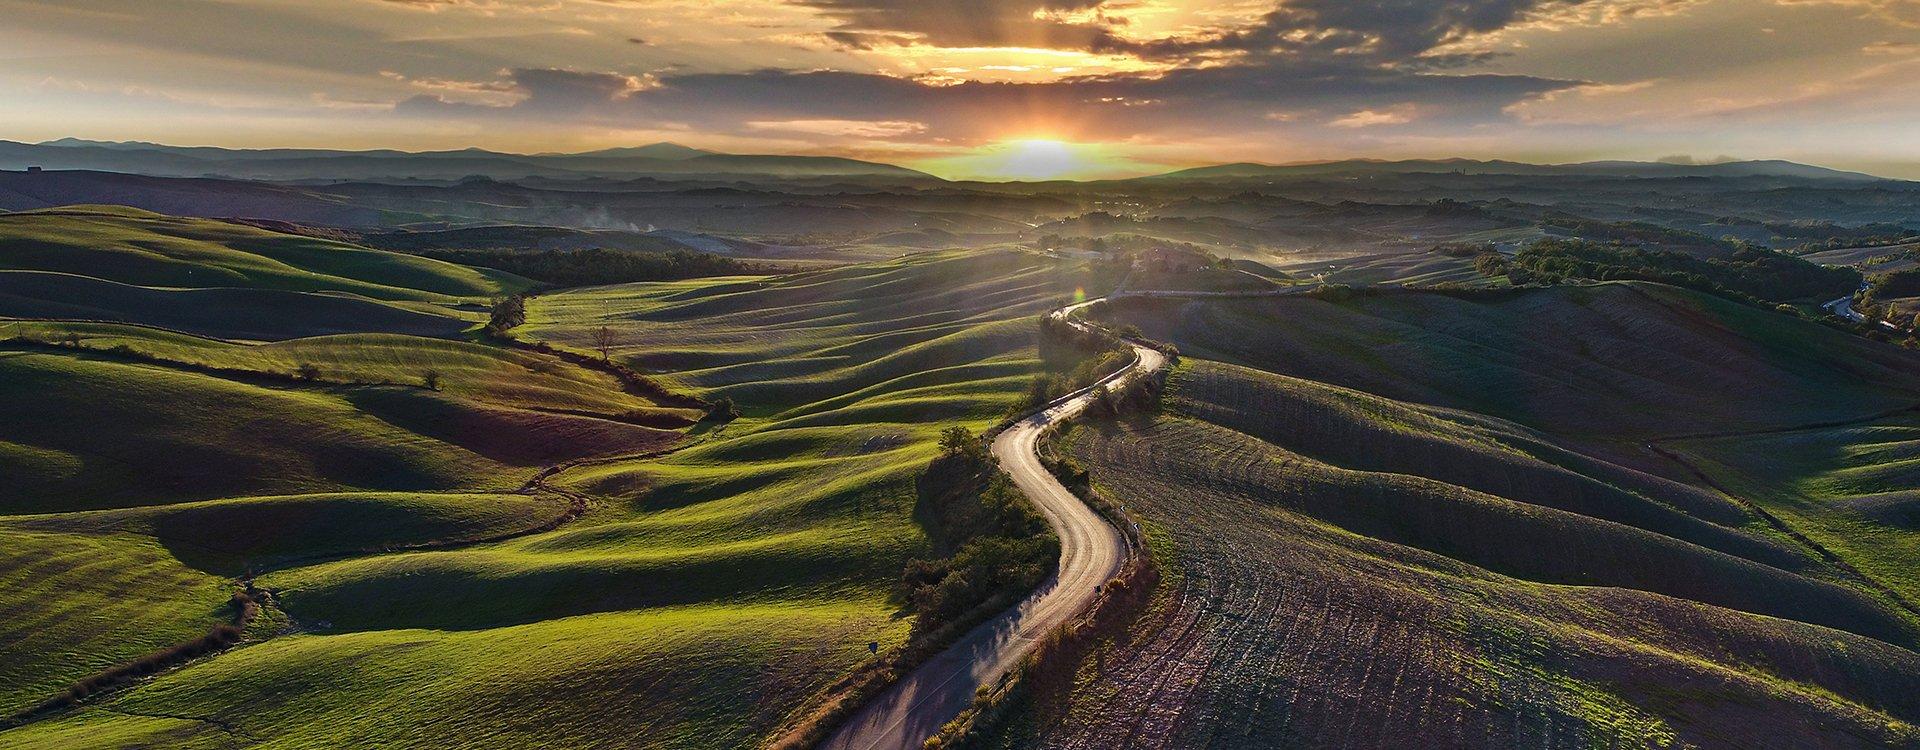 Pedogenesis of our Soil